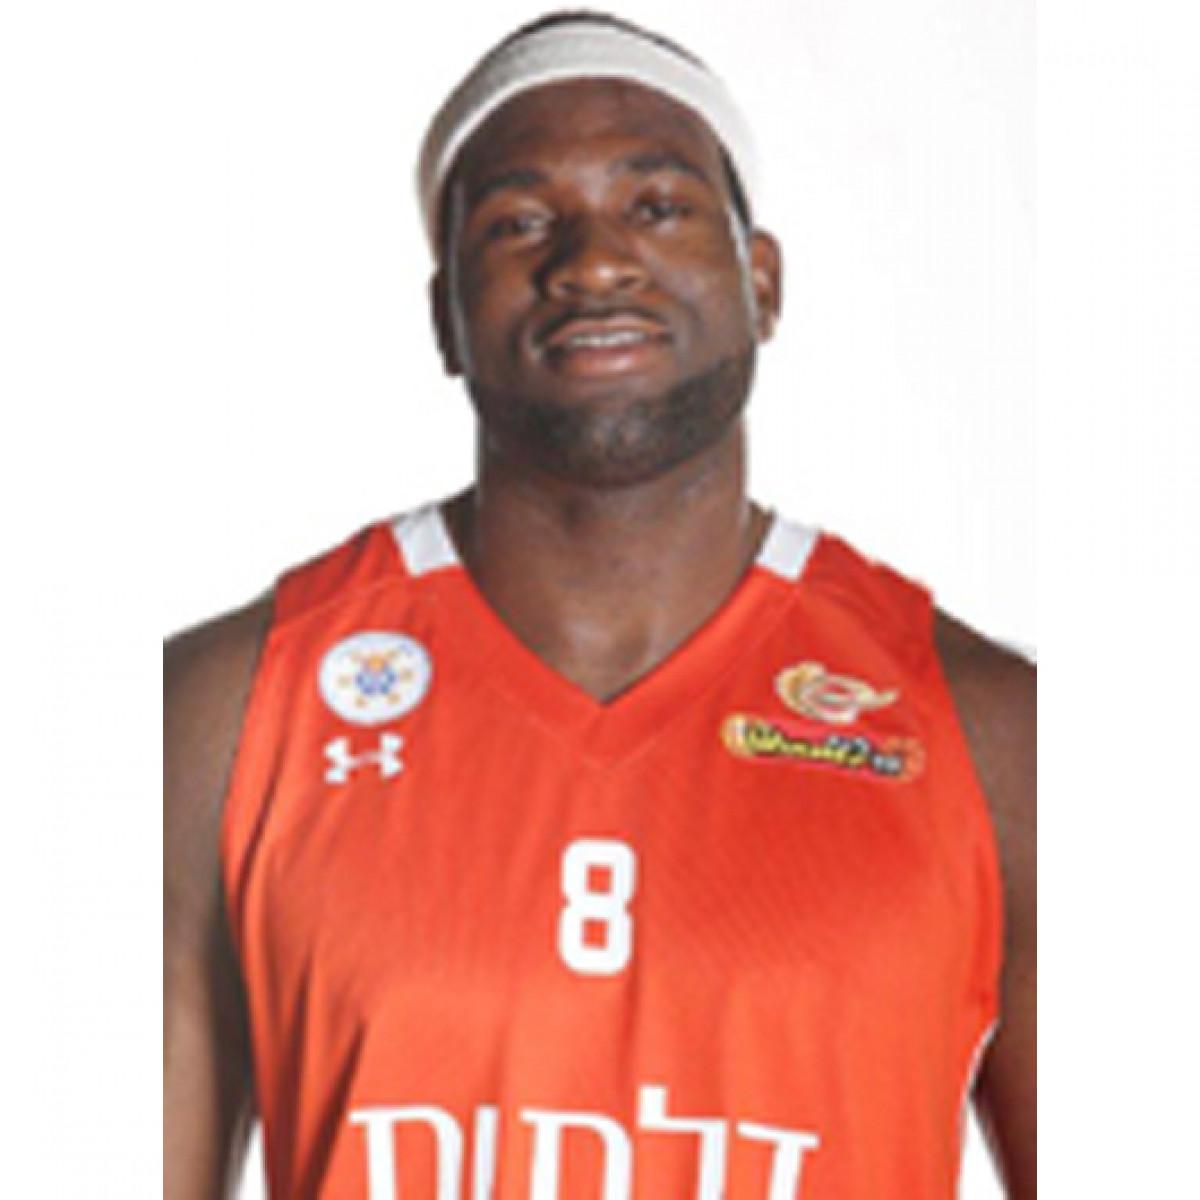 Photo of Adrian Uter, 2012-2013 season